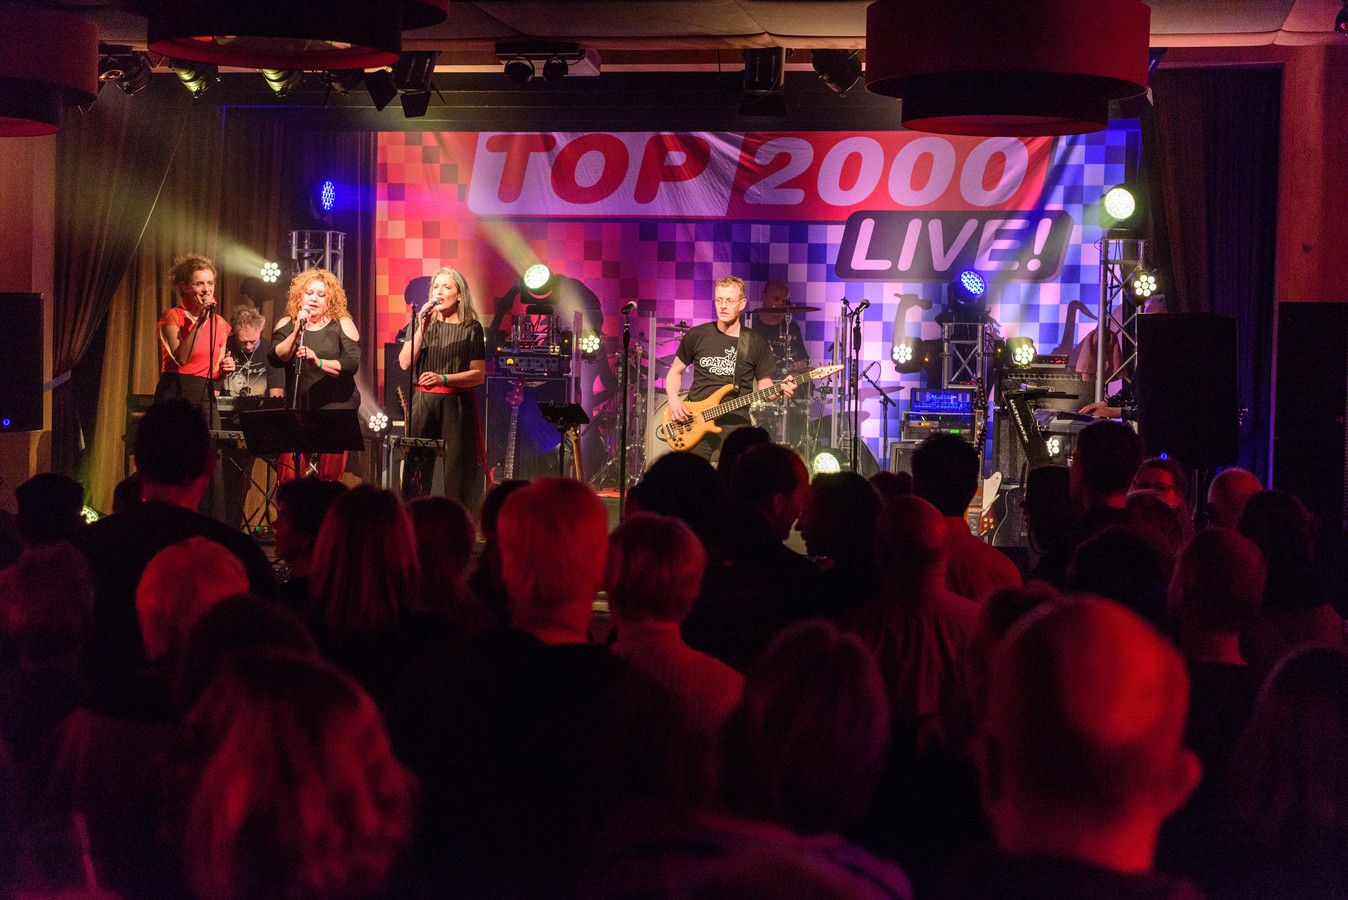 Top 2000 Live.